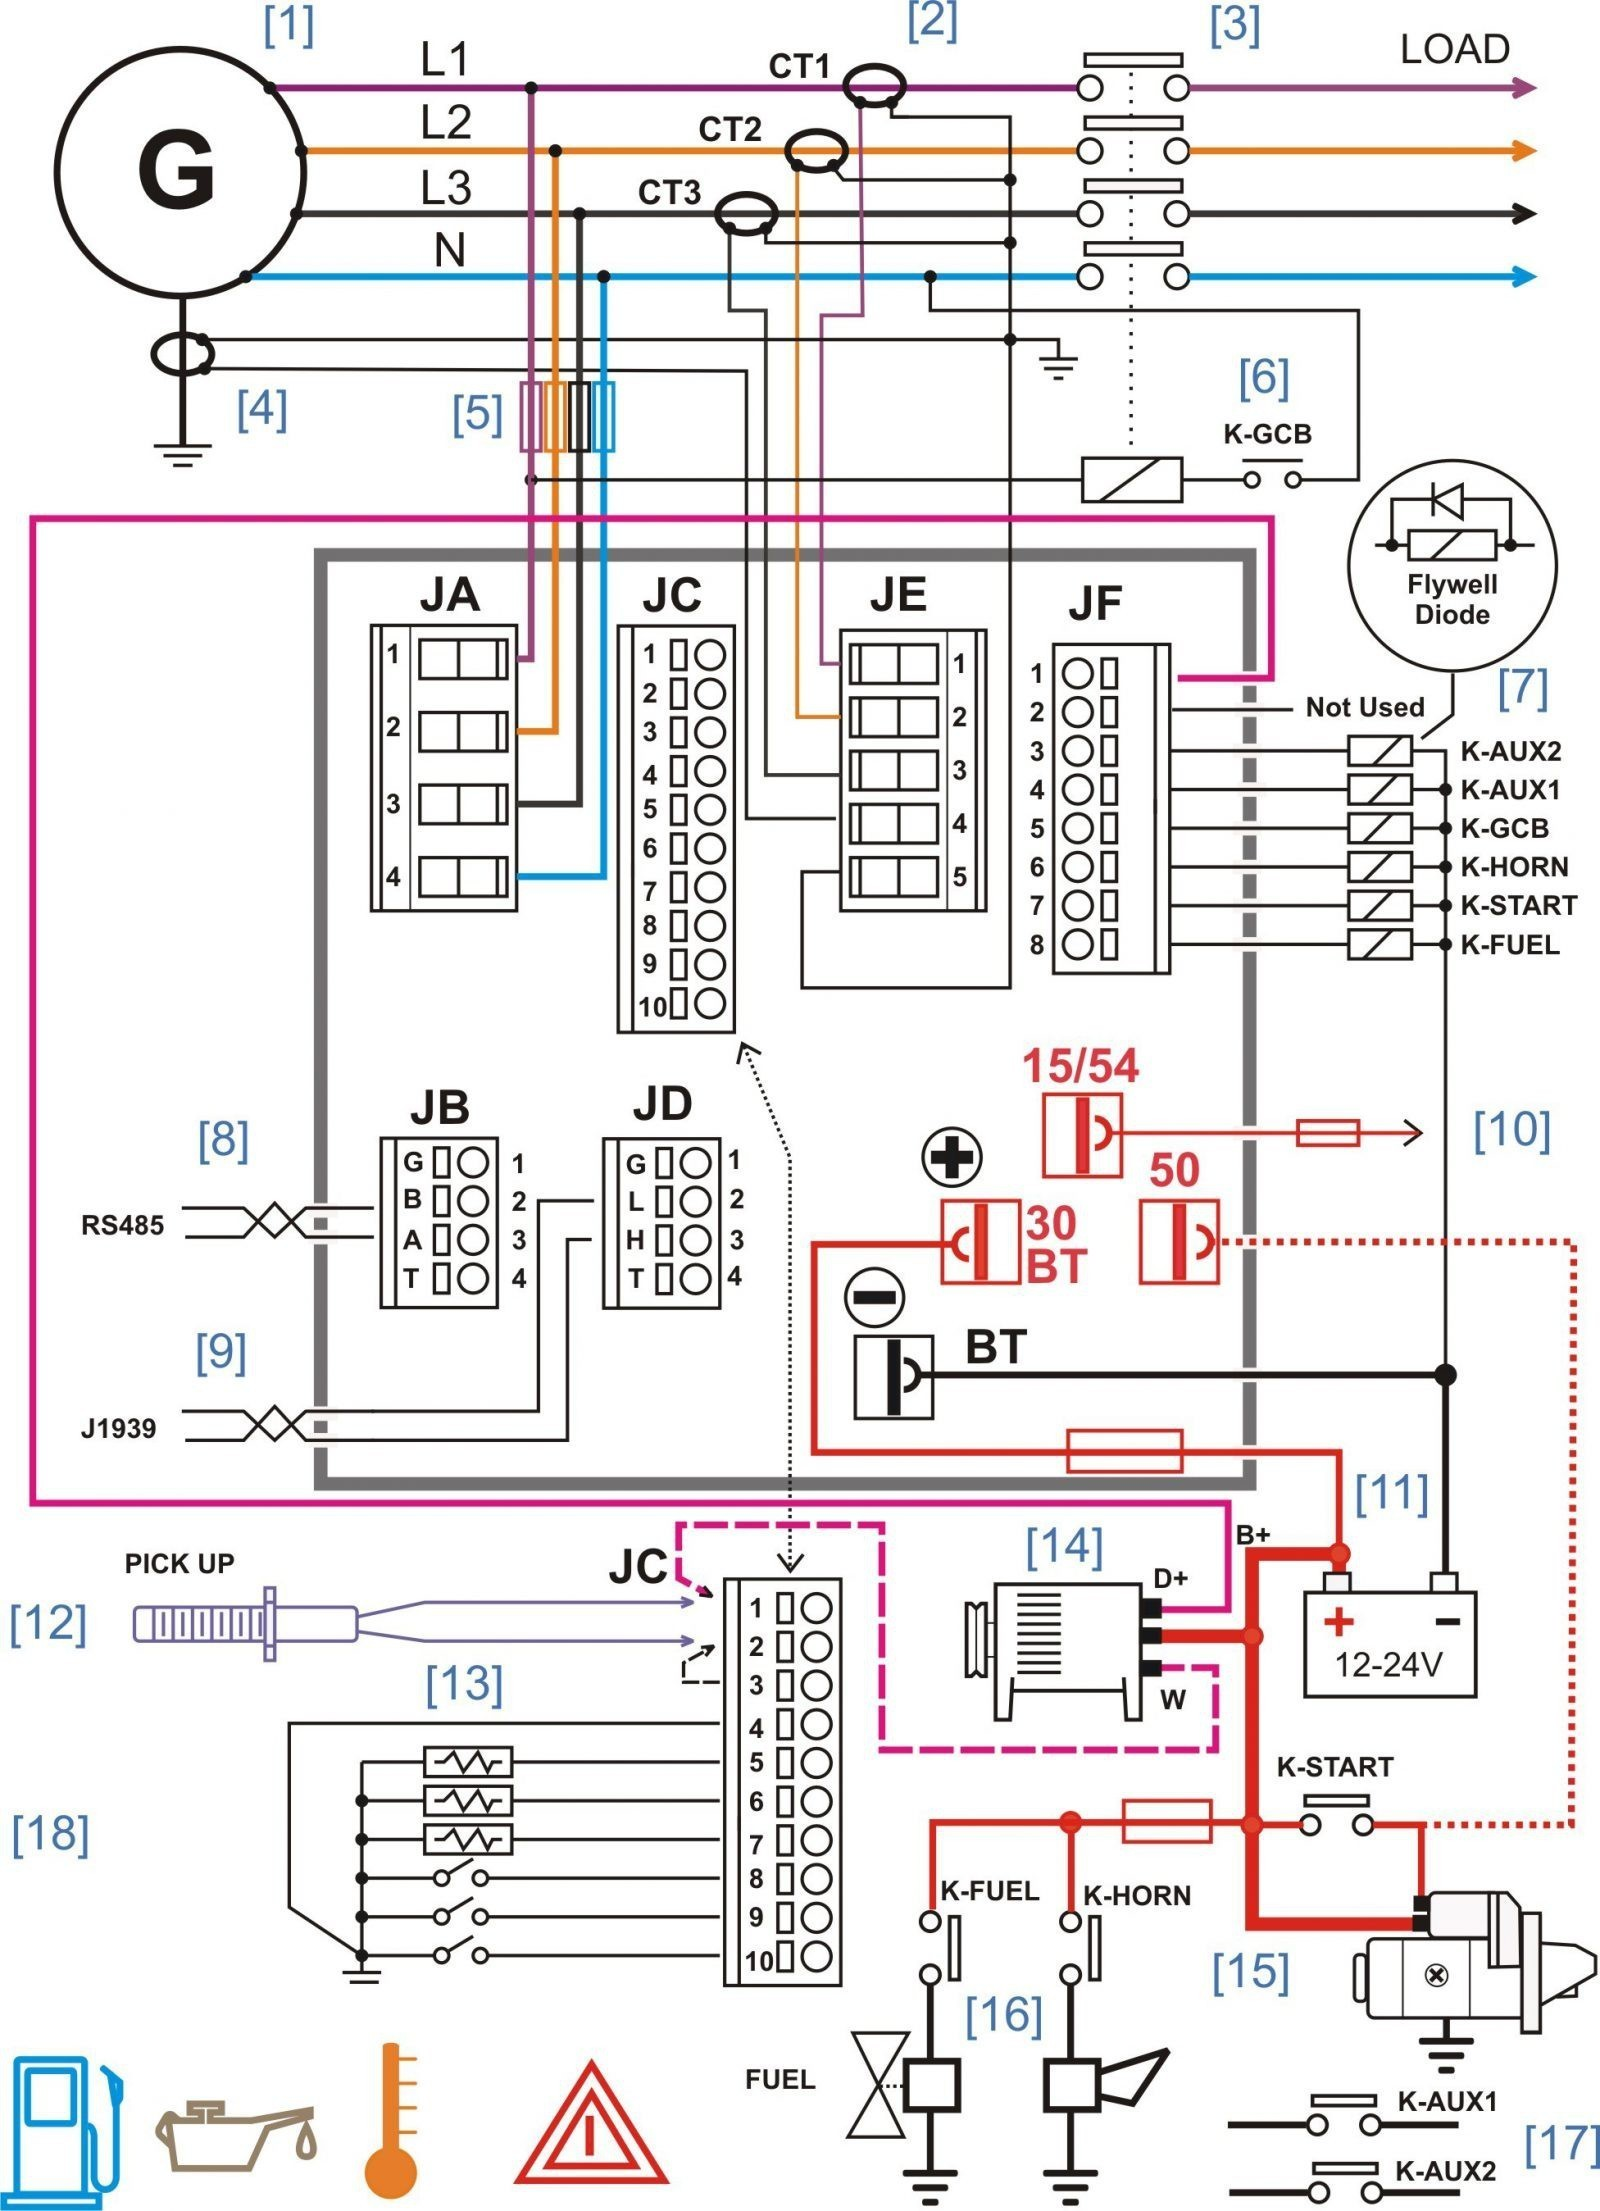 Car Stereo Wiring Diagrams Free Simple Diagram A Car Of Car Stereo Wiring Diagrams Free